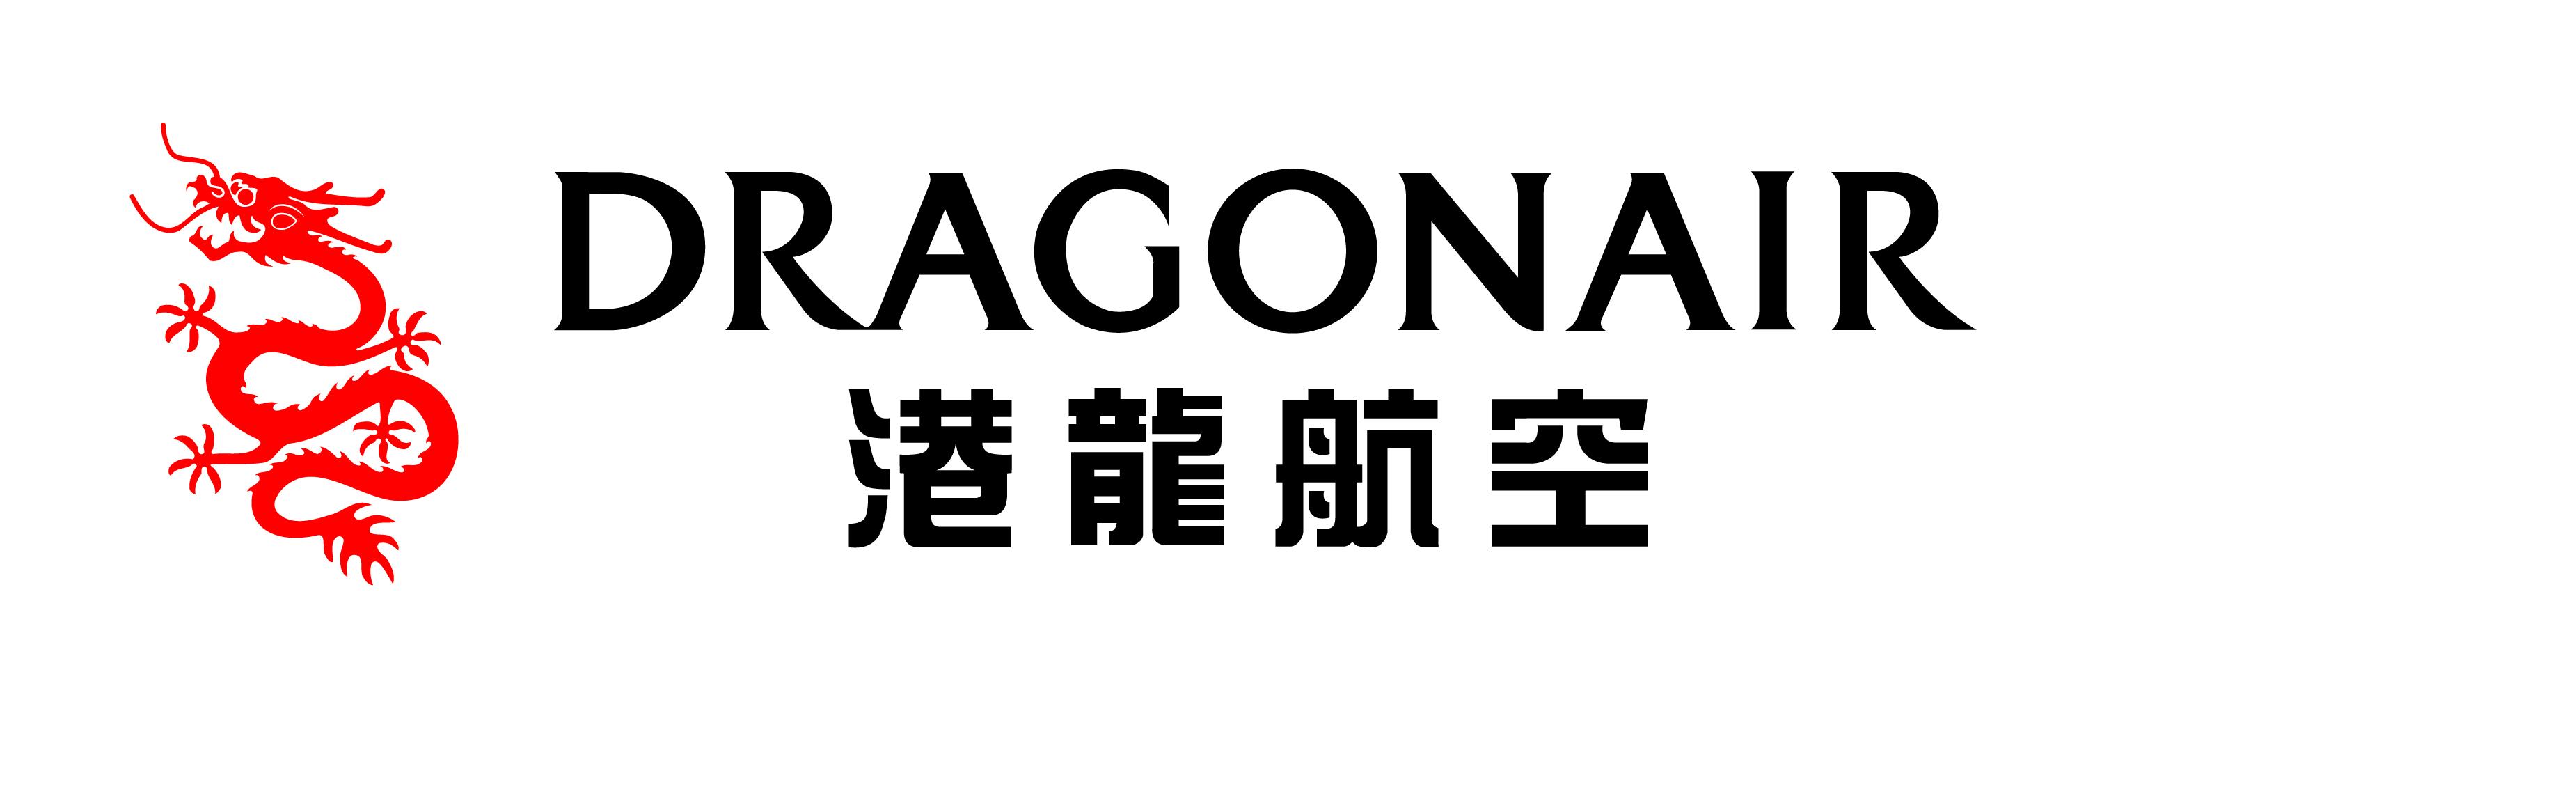 Dragon Air Logos - Dragonair, Transparent background PNG HD thumbnail